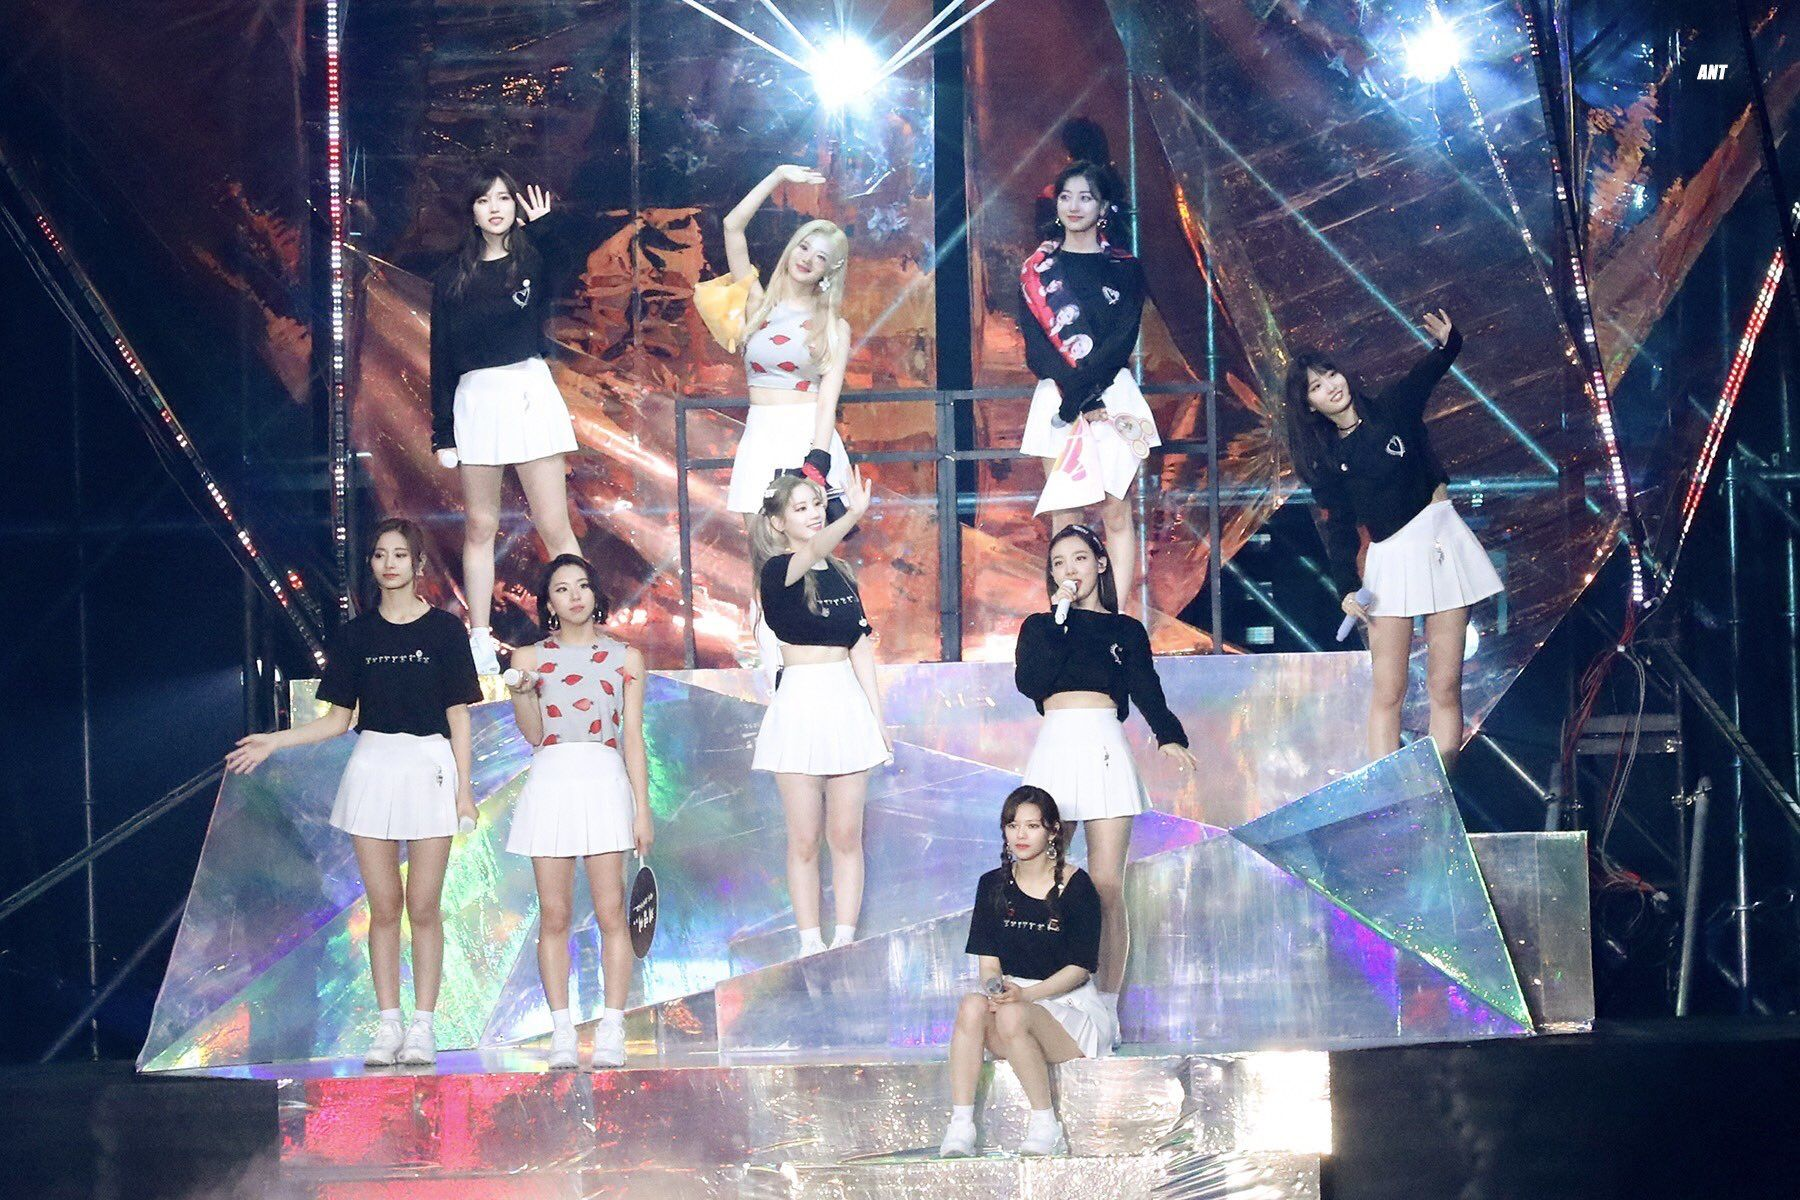 190526 Twice World Tour 2019 Twice Lights In Seoul Day2 Twice 트